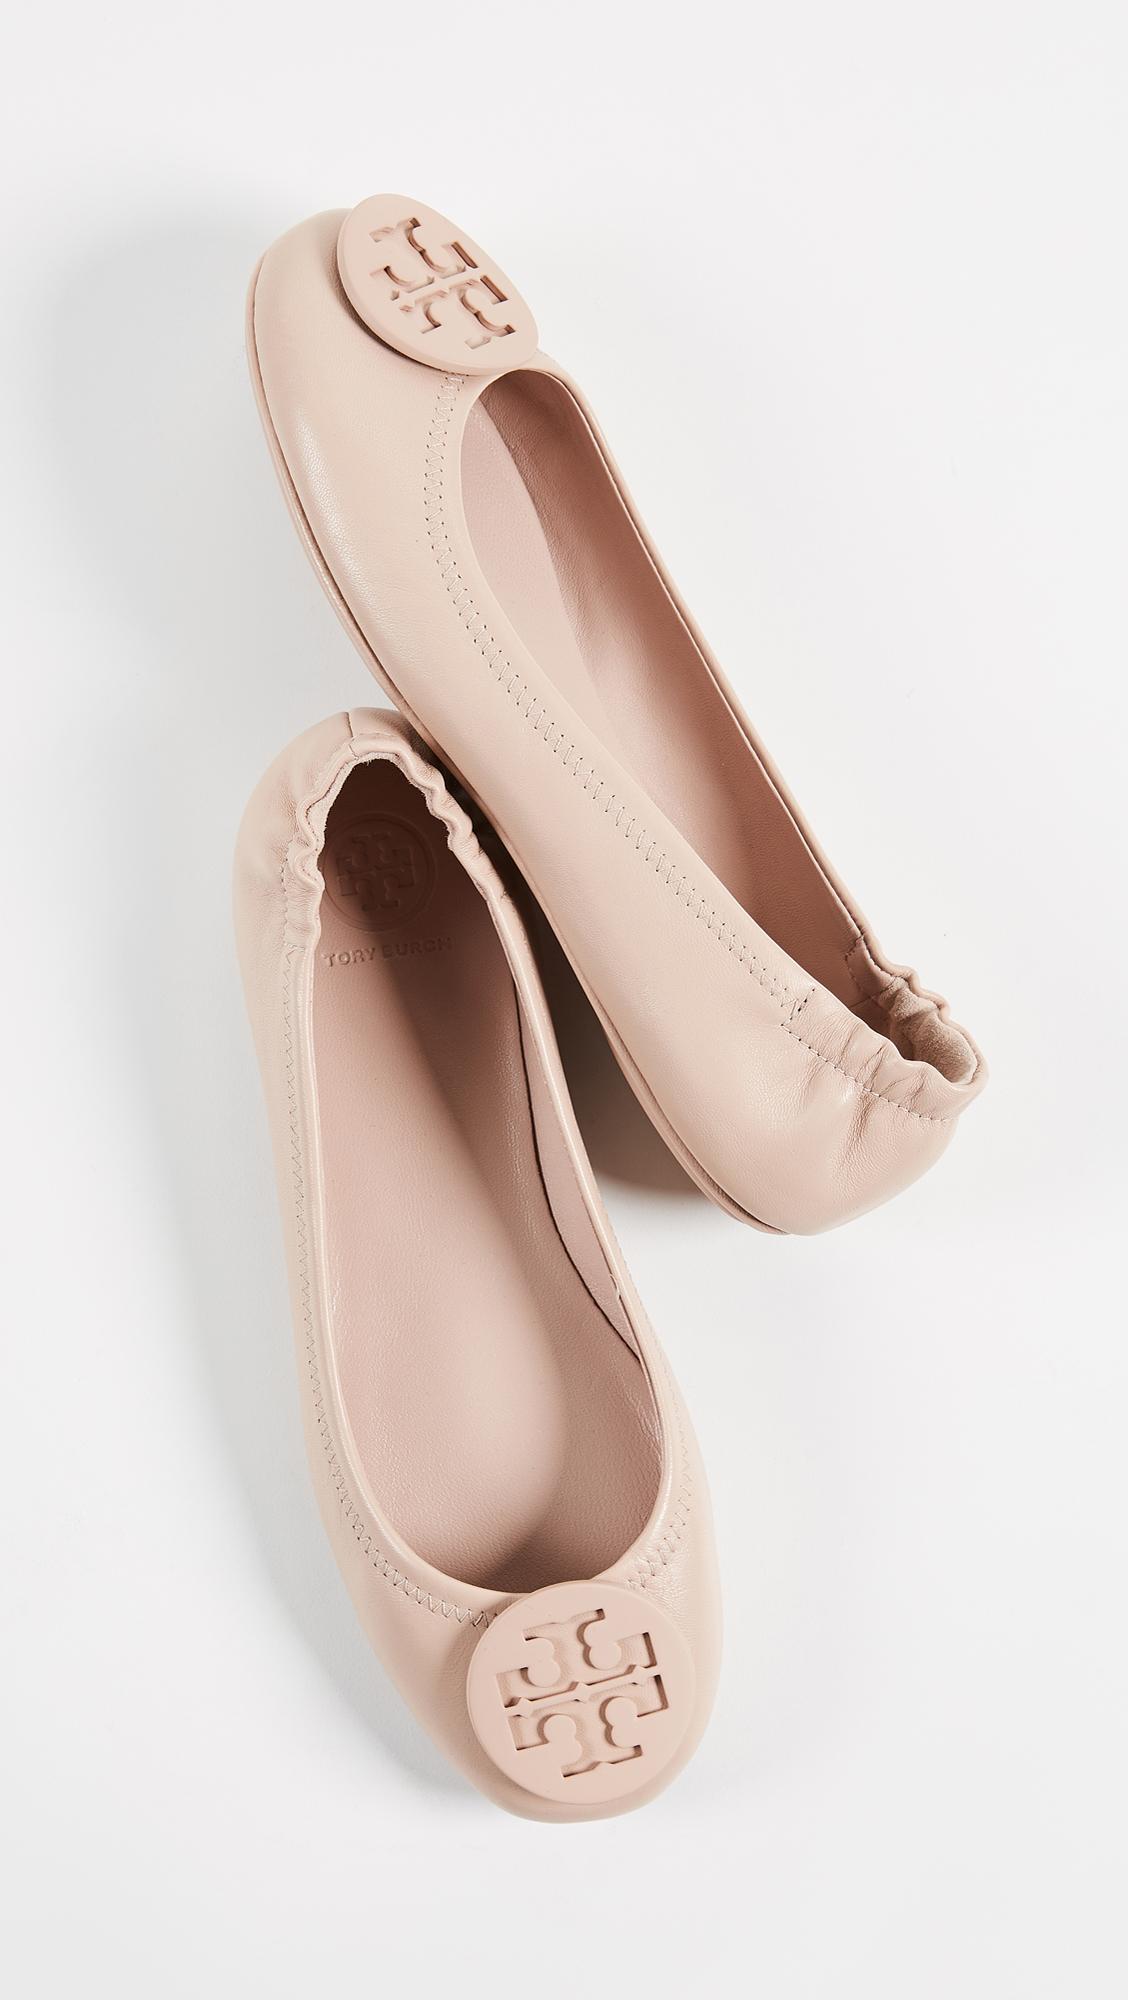 913bcc3baae Tory Burch Minnie Travel Ballet Flats